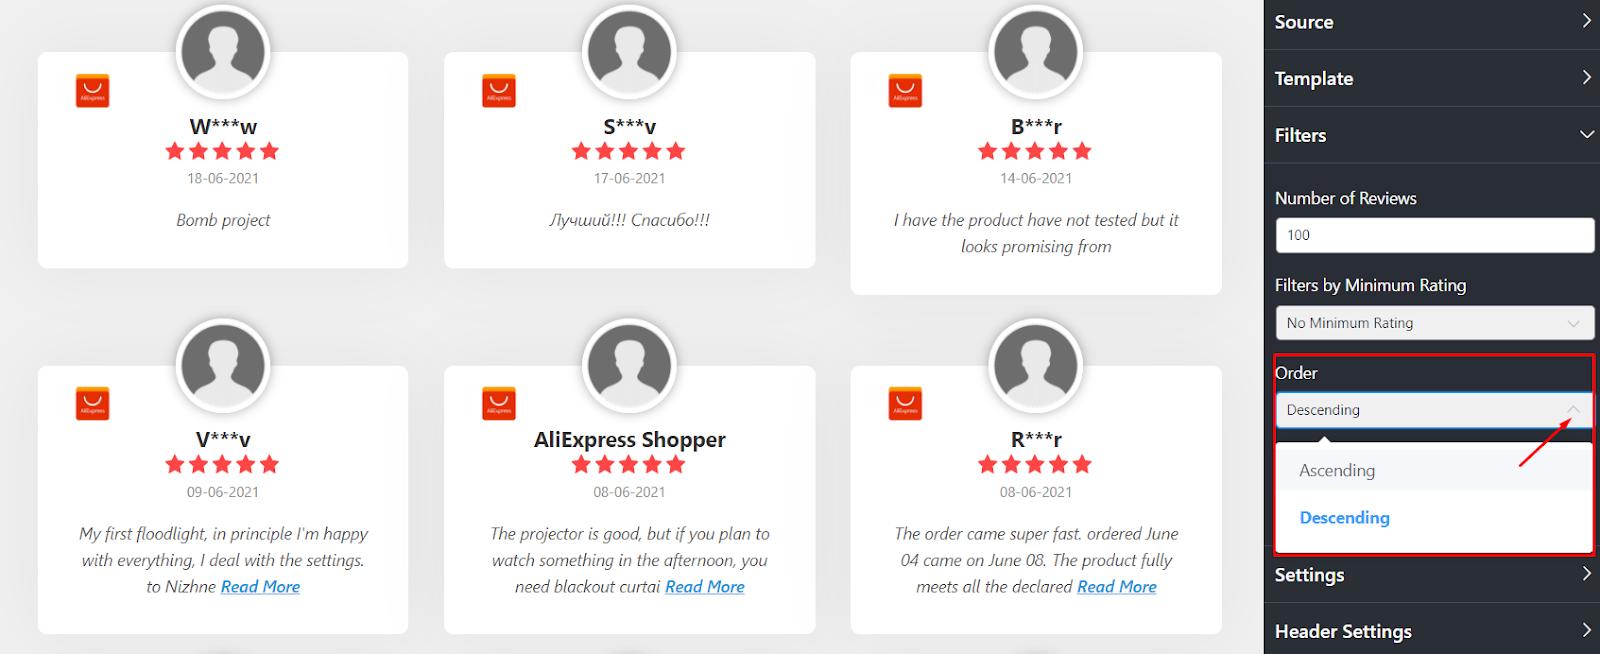 AliExpress reviews order